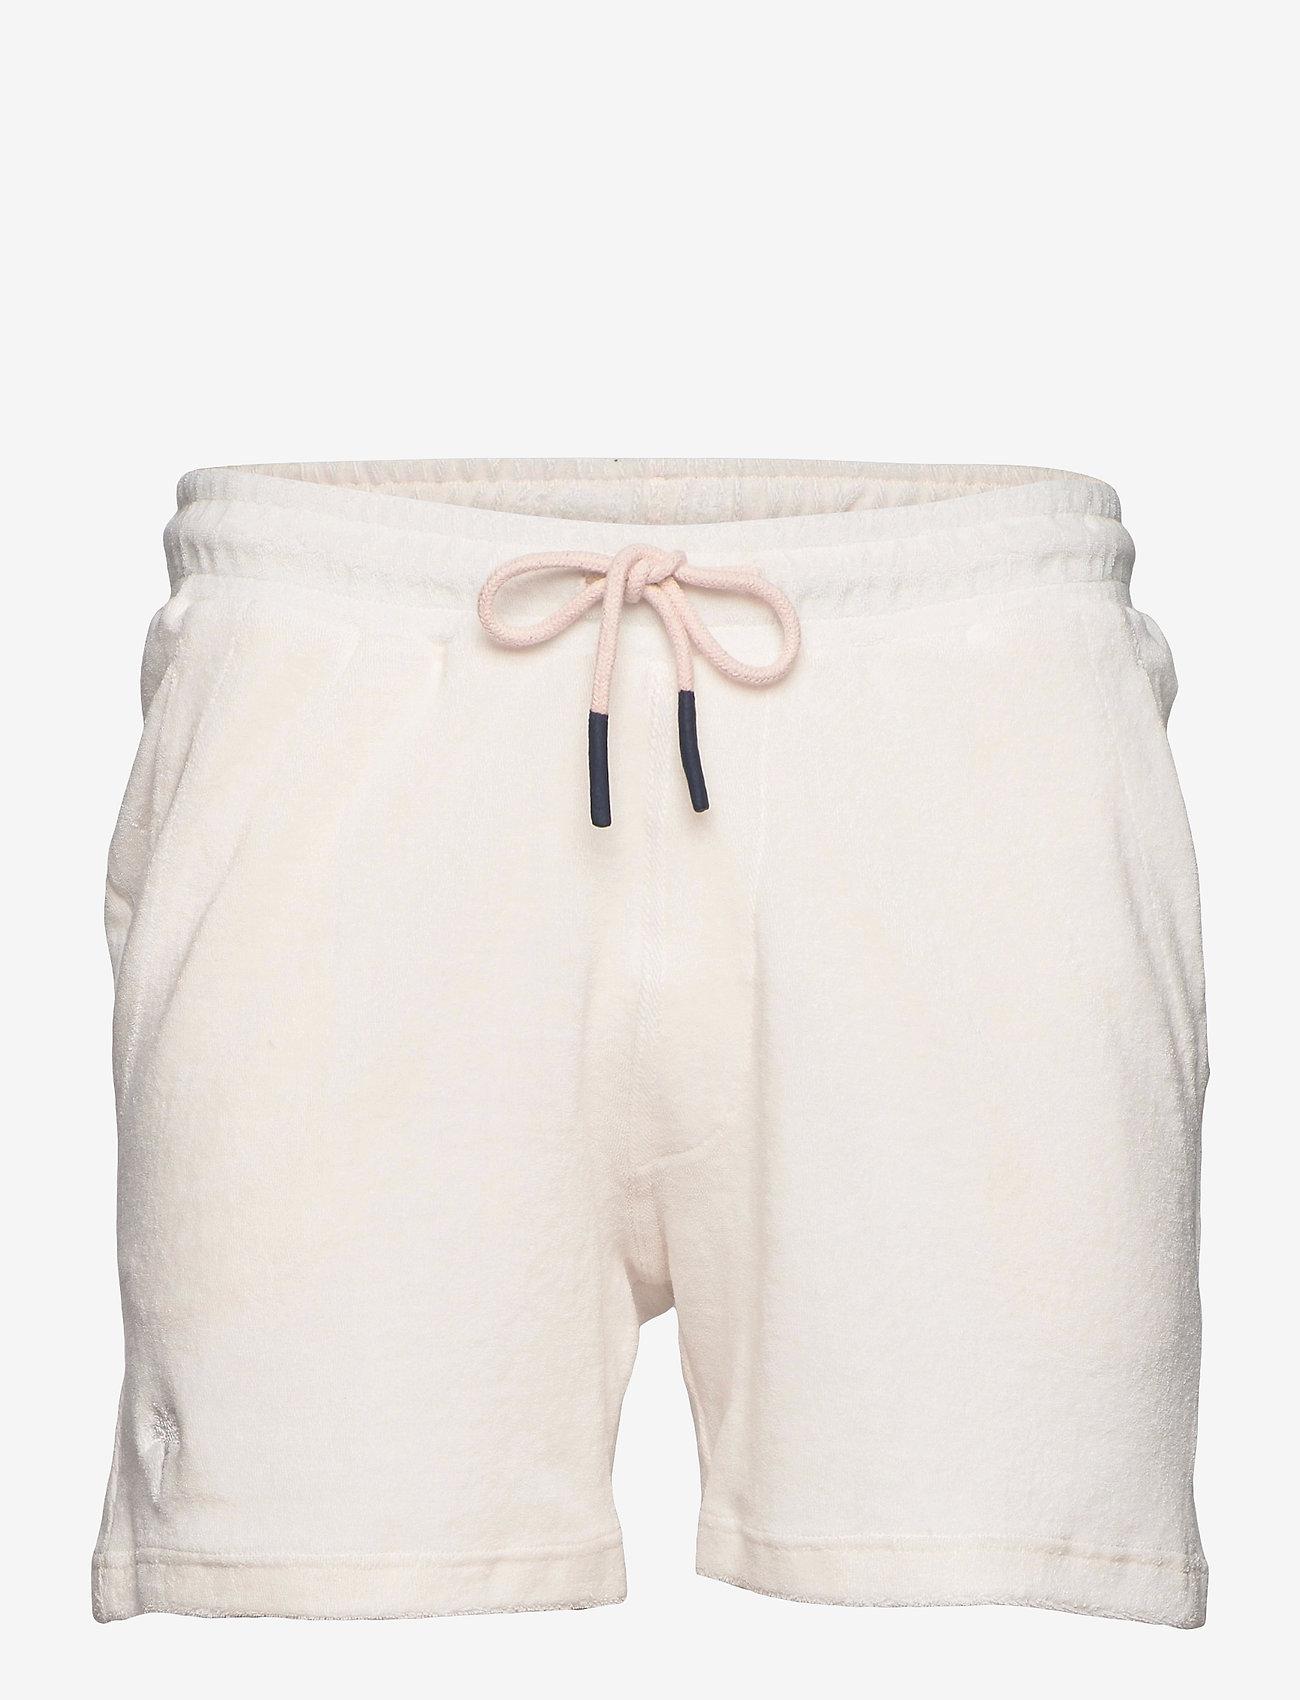 OAS - White Terry Shorts - casual shorts - white - 0